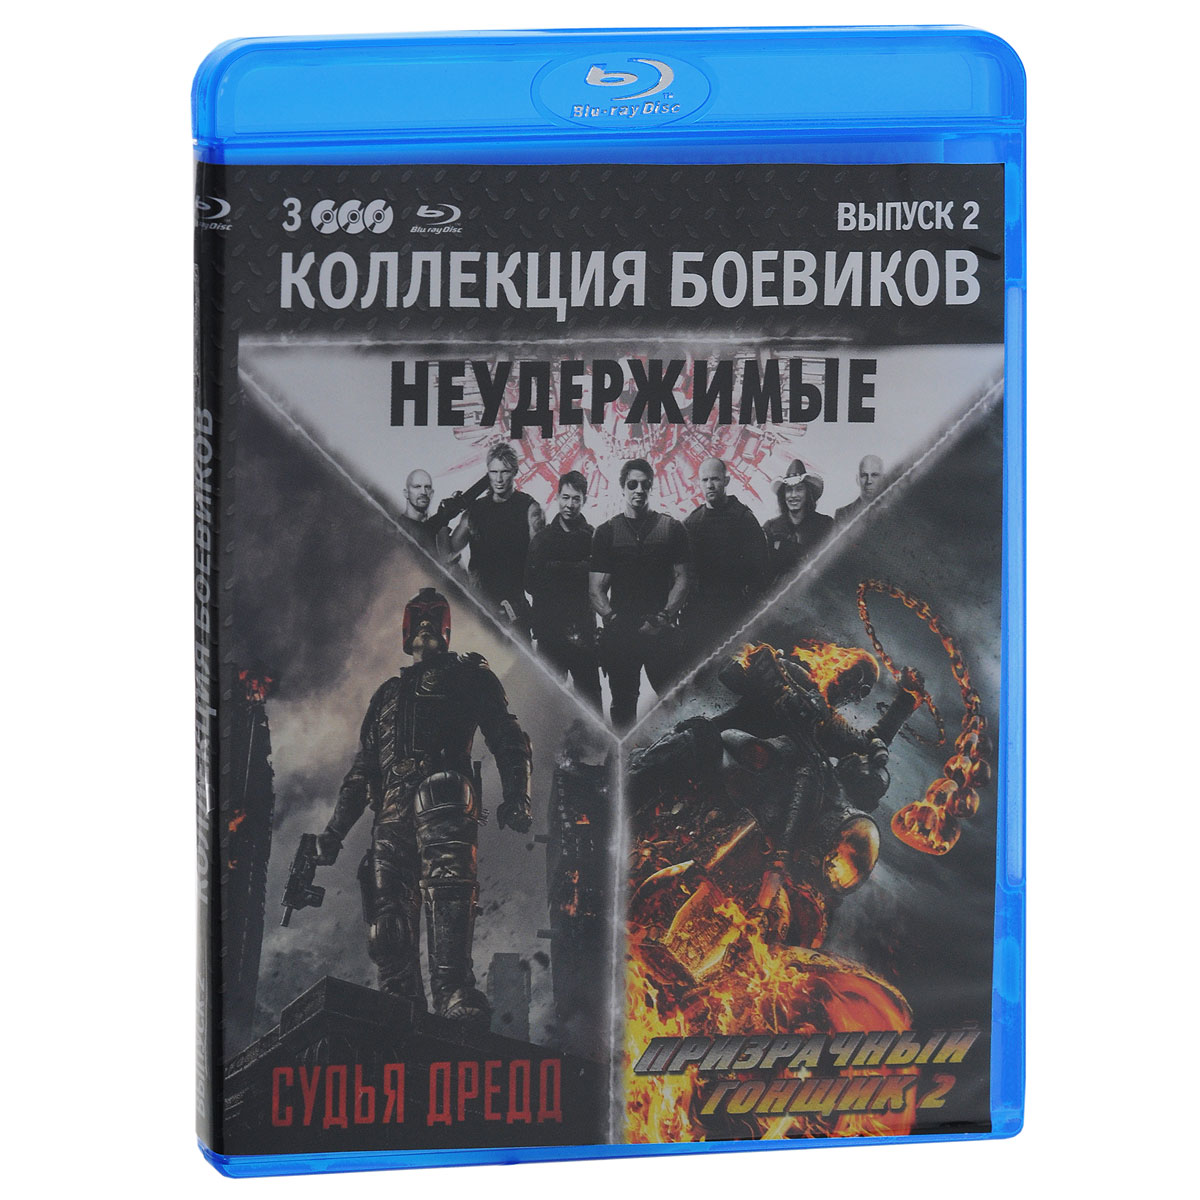 Неудержимые / Судья Дредд / Призрачный гонщик 2 (3 Blu-ray) мадагаскар 1 3 3 blu ray